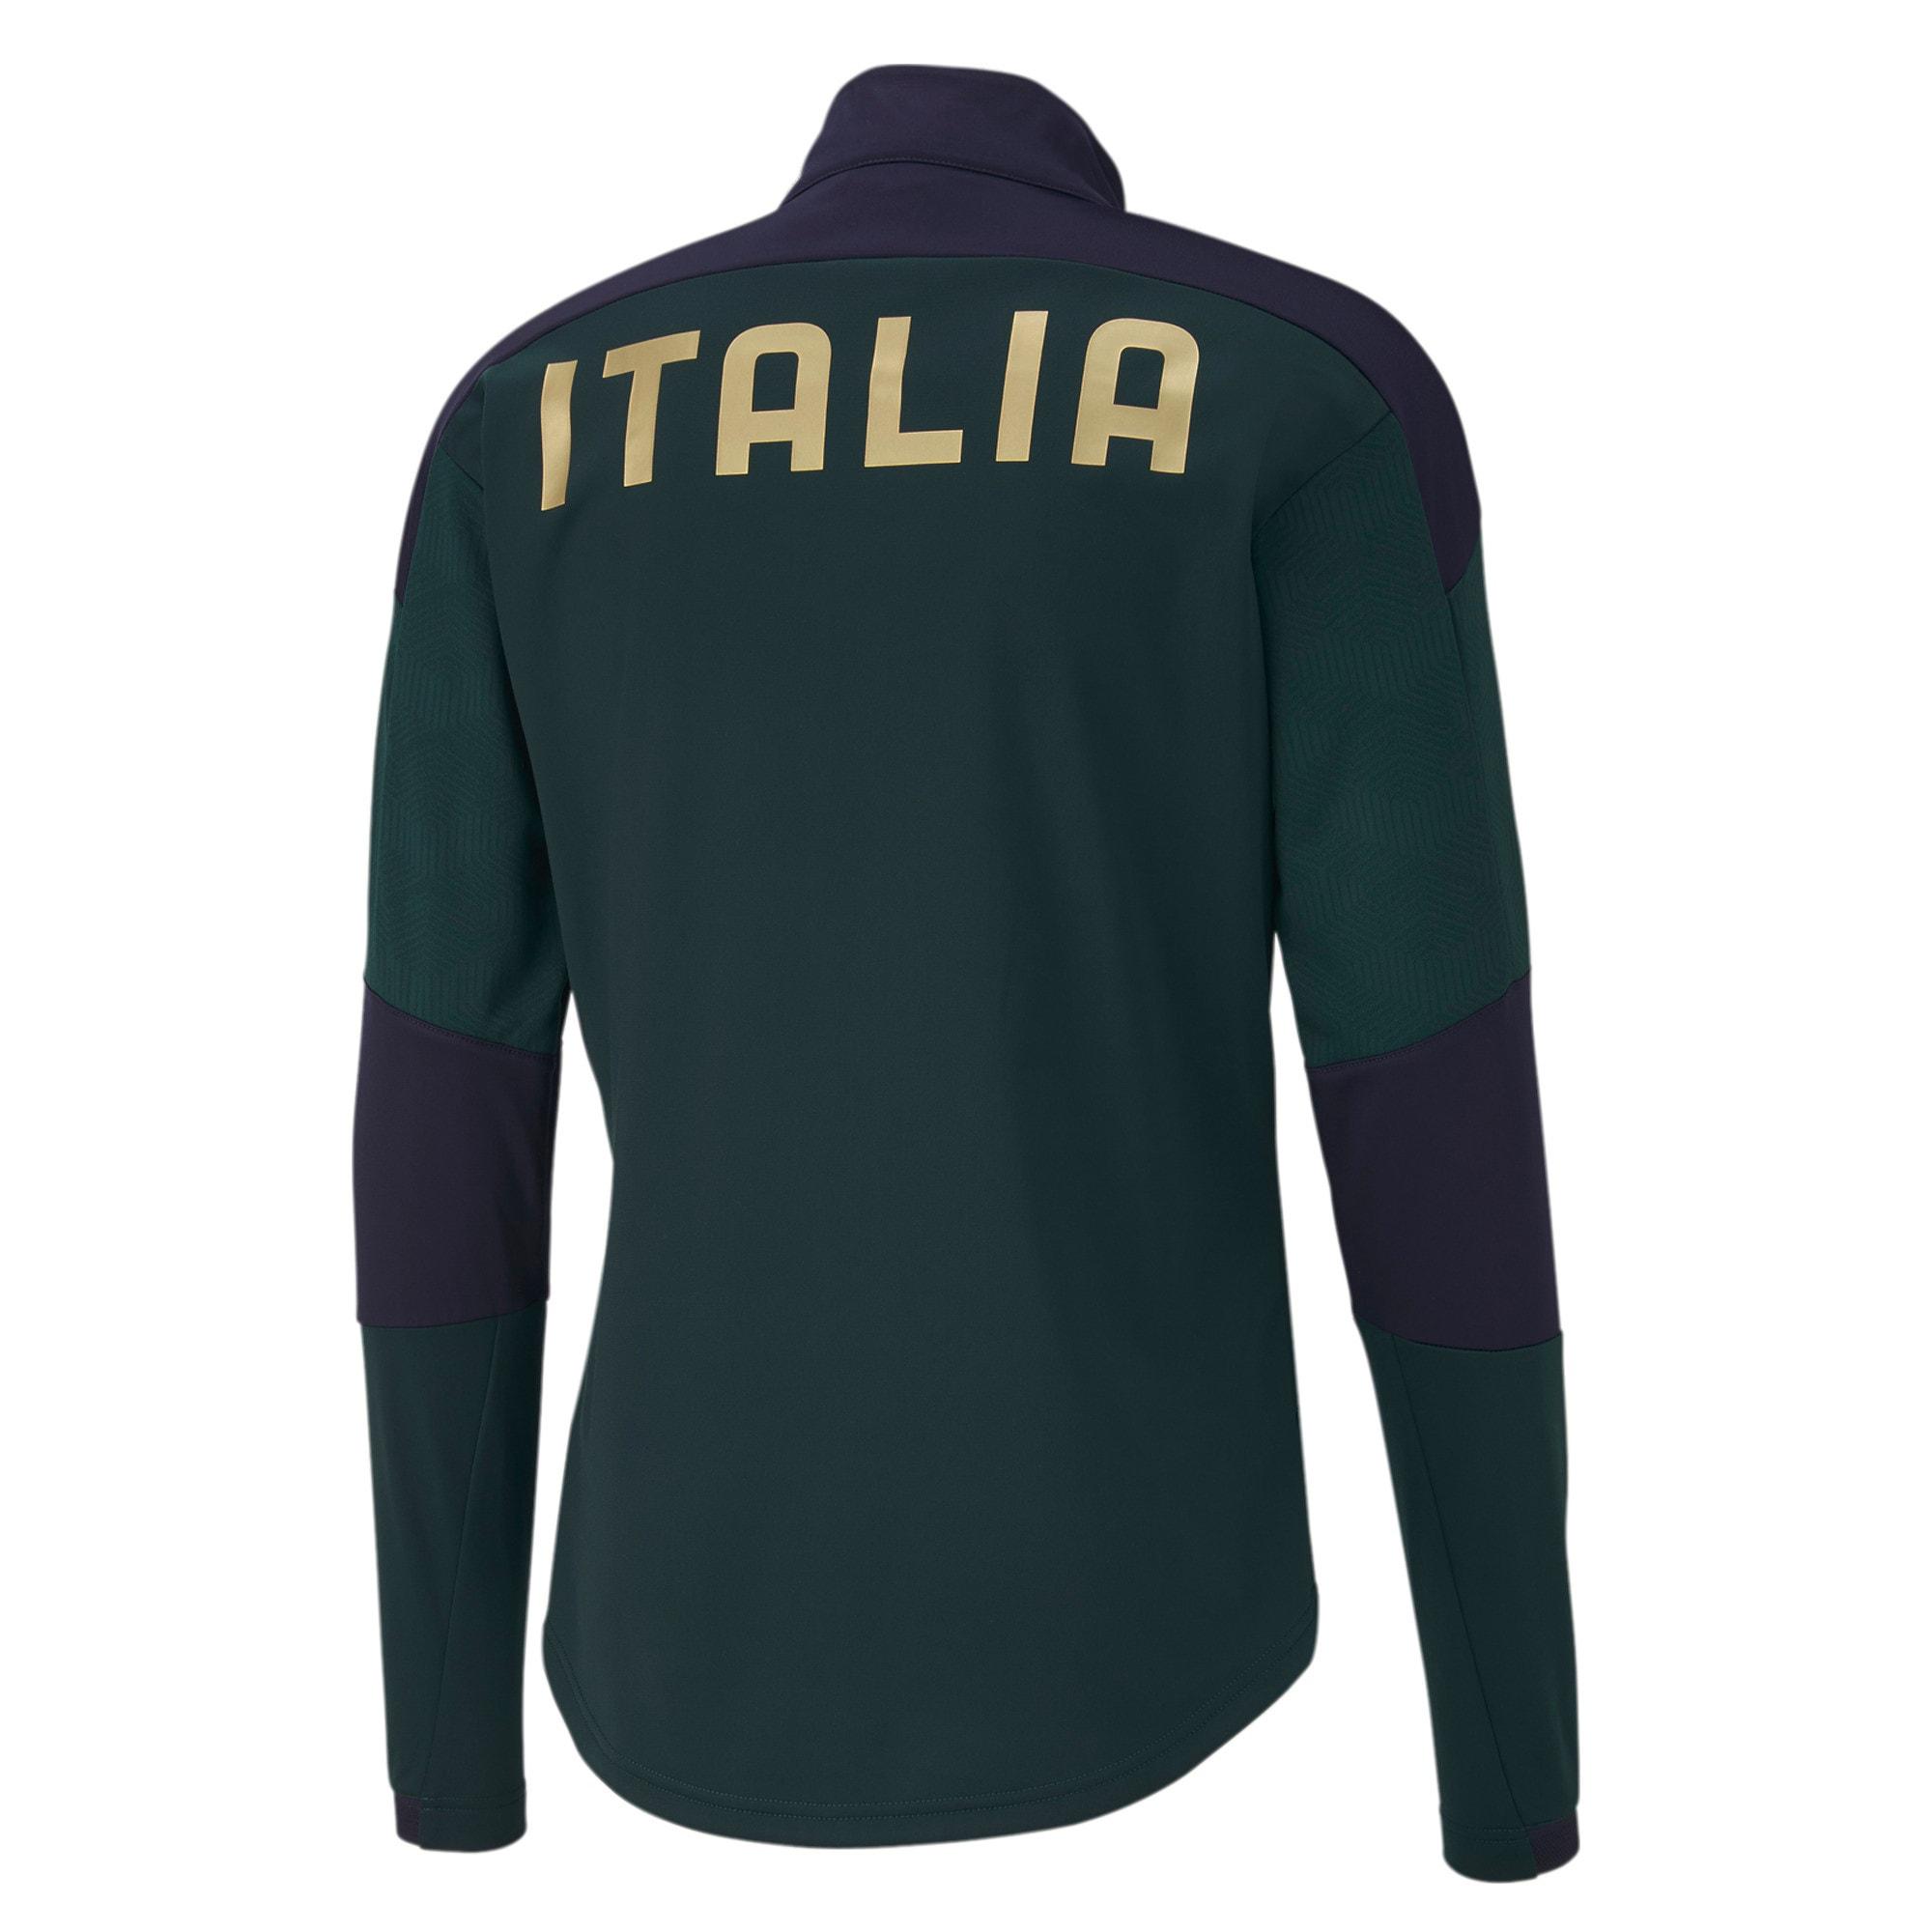 Thumbnail 2 of FIGC Men's Training Jacket, Ponderosa Pine-Peacoat, medium